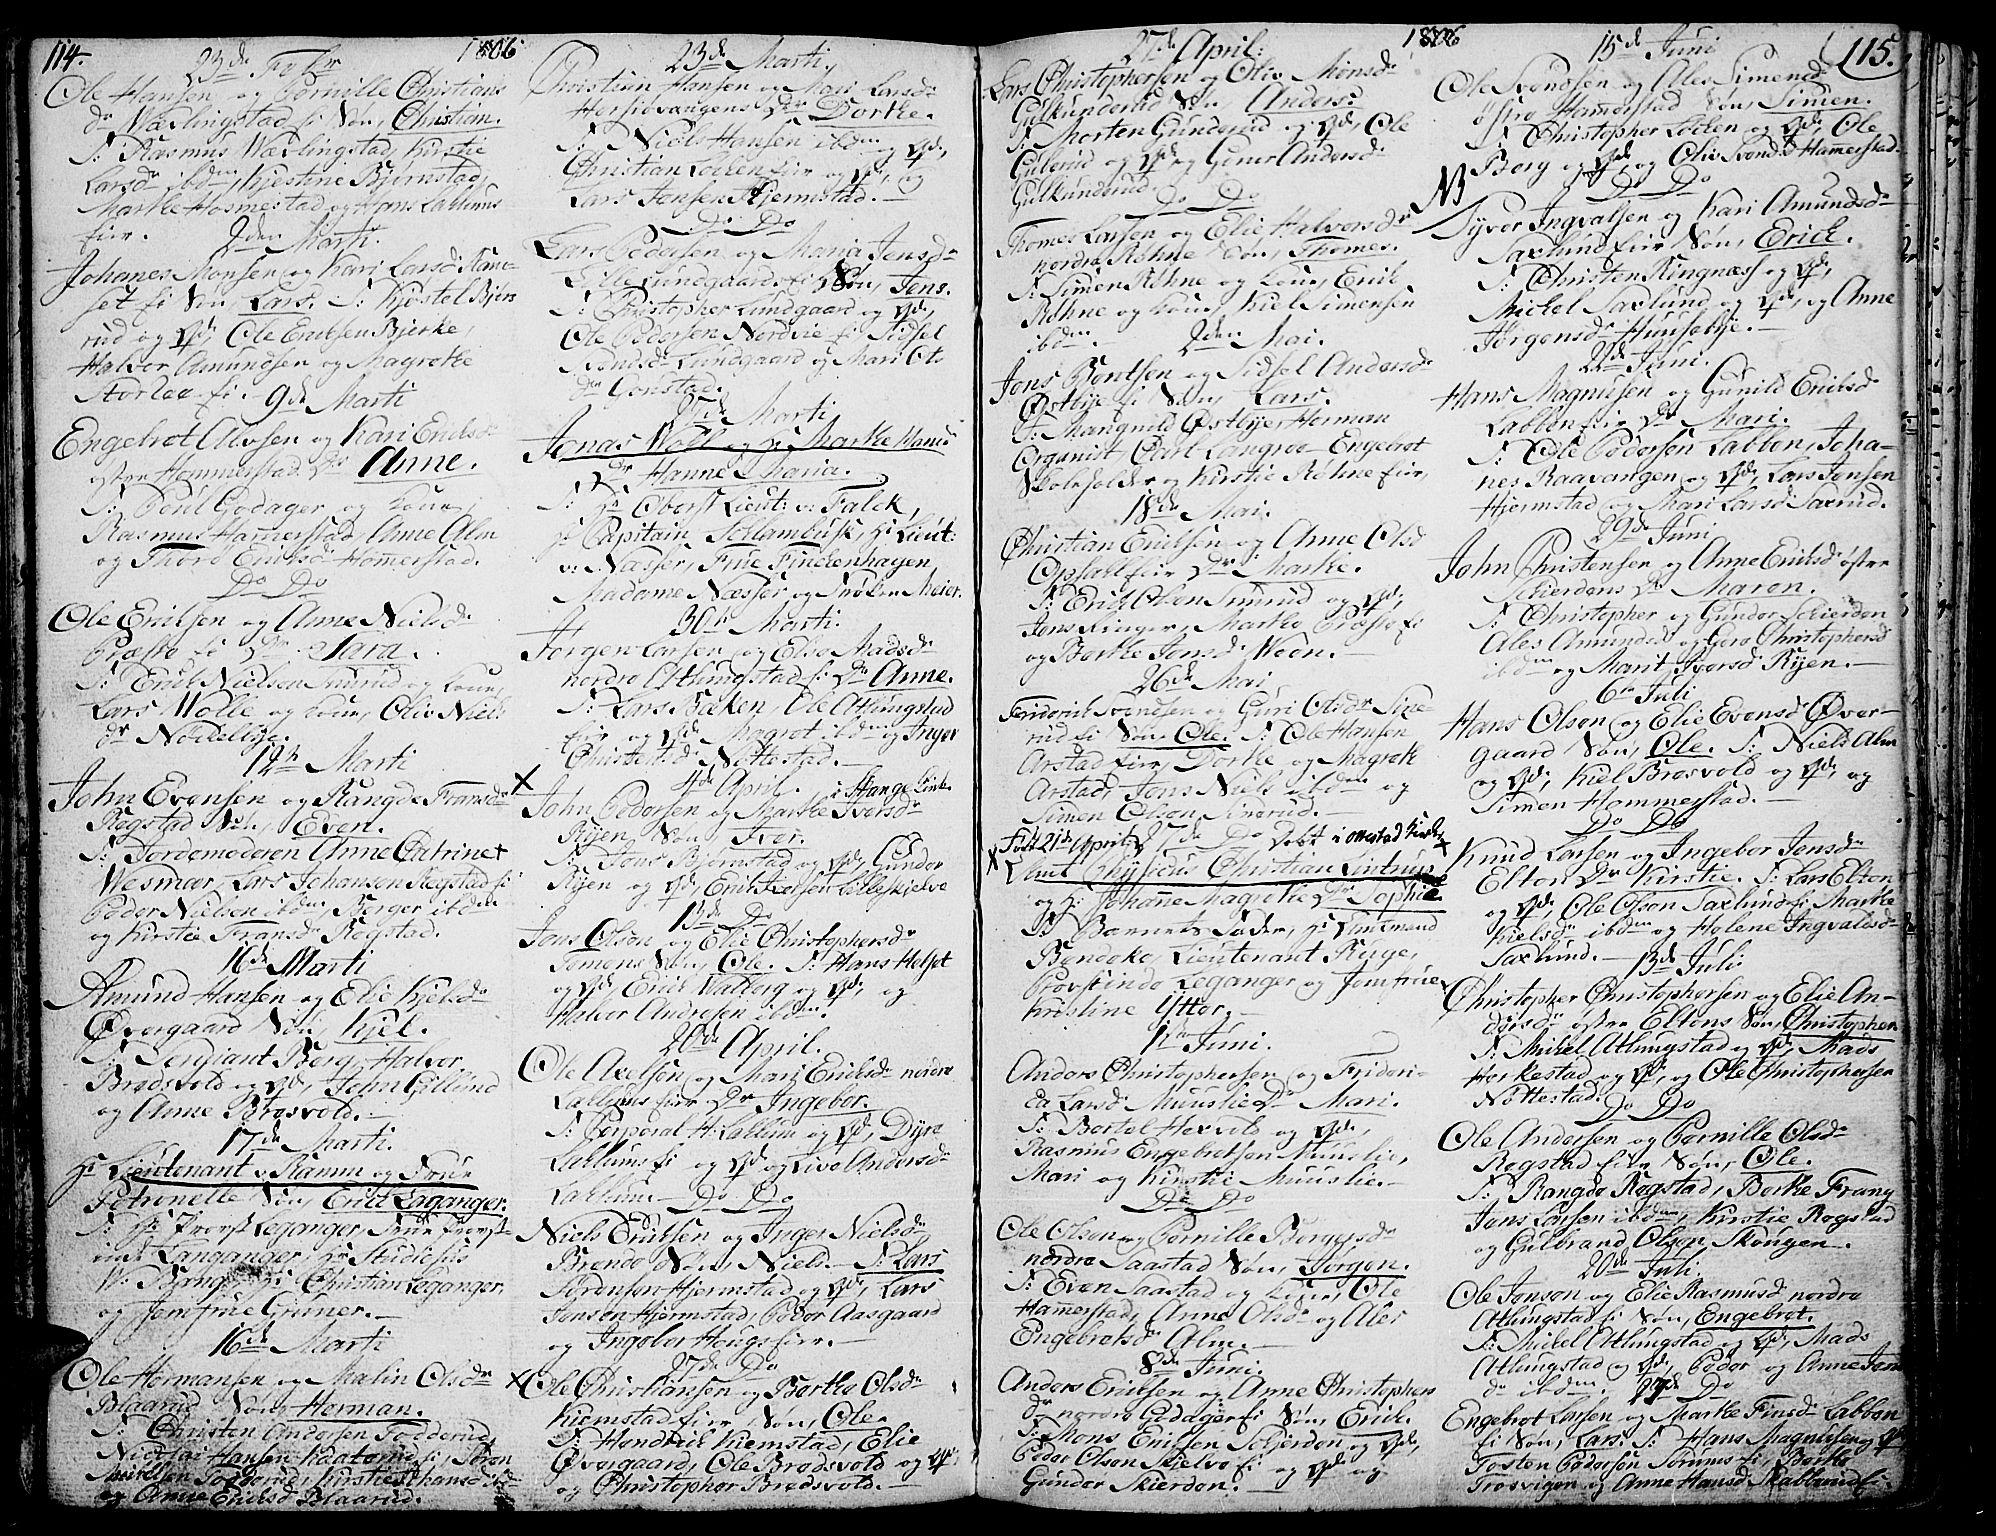 SAH, Stange prestekontor, K/L0007: Ministerialbok nr. 7, 1788-1813, s. 114-115